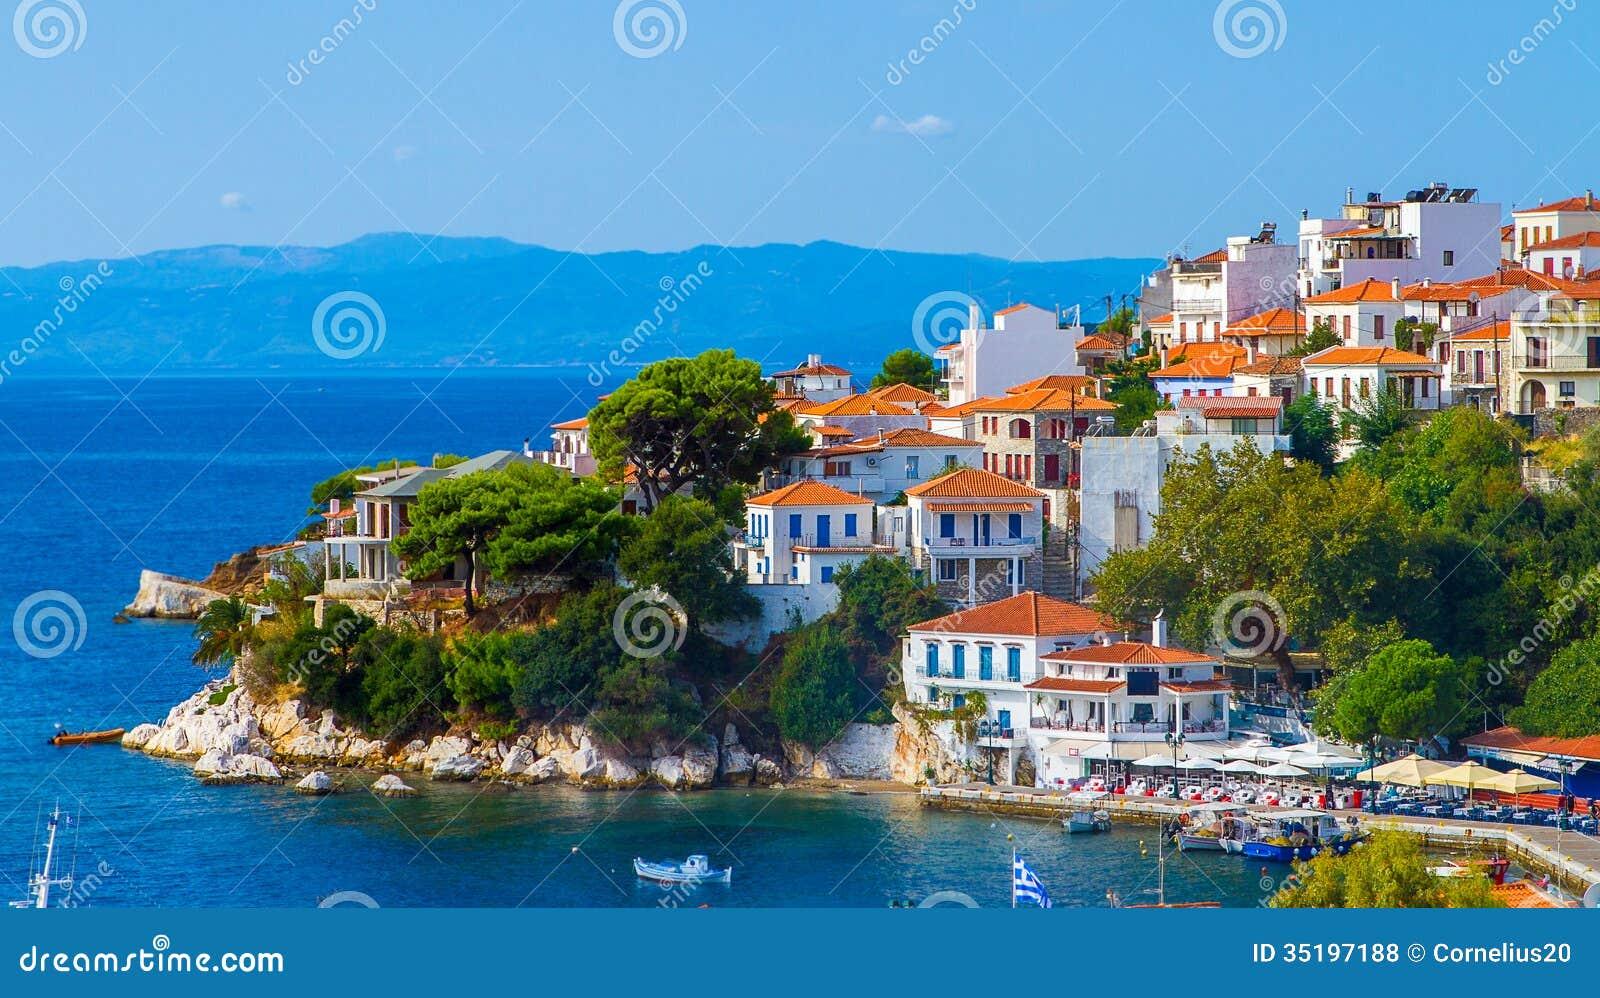 Ville de bord de la mer photos libres de droits image - Ville bord de mer mediterranee ...